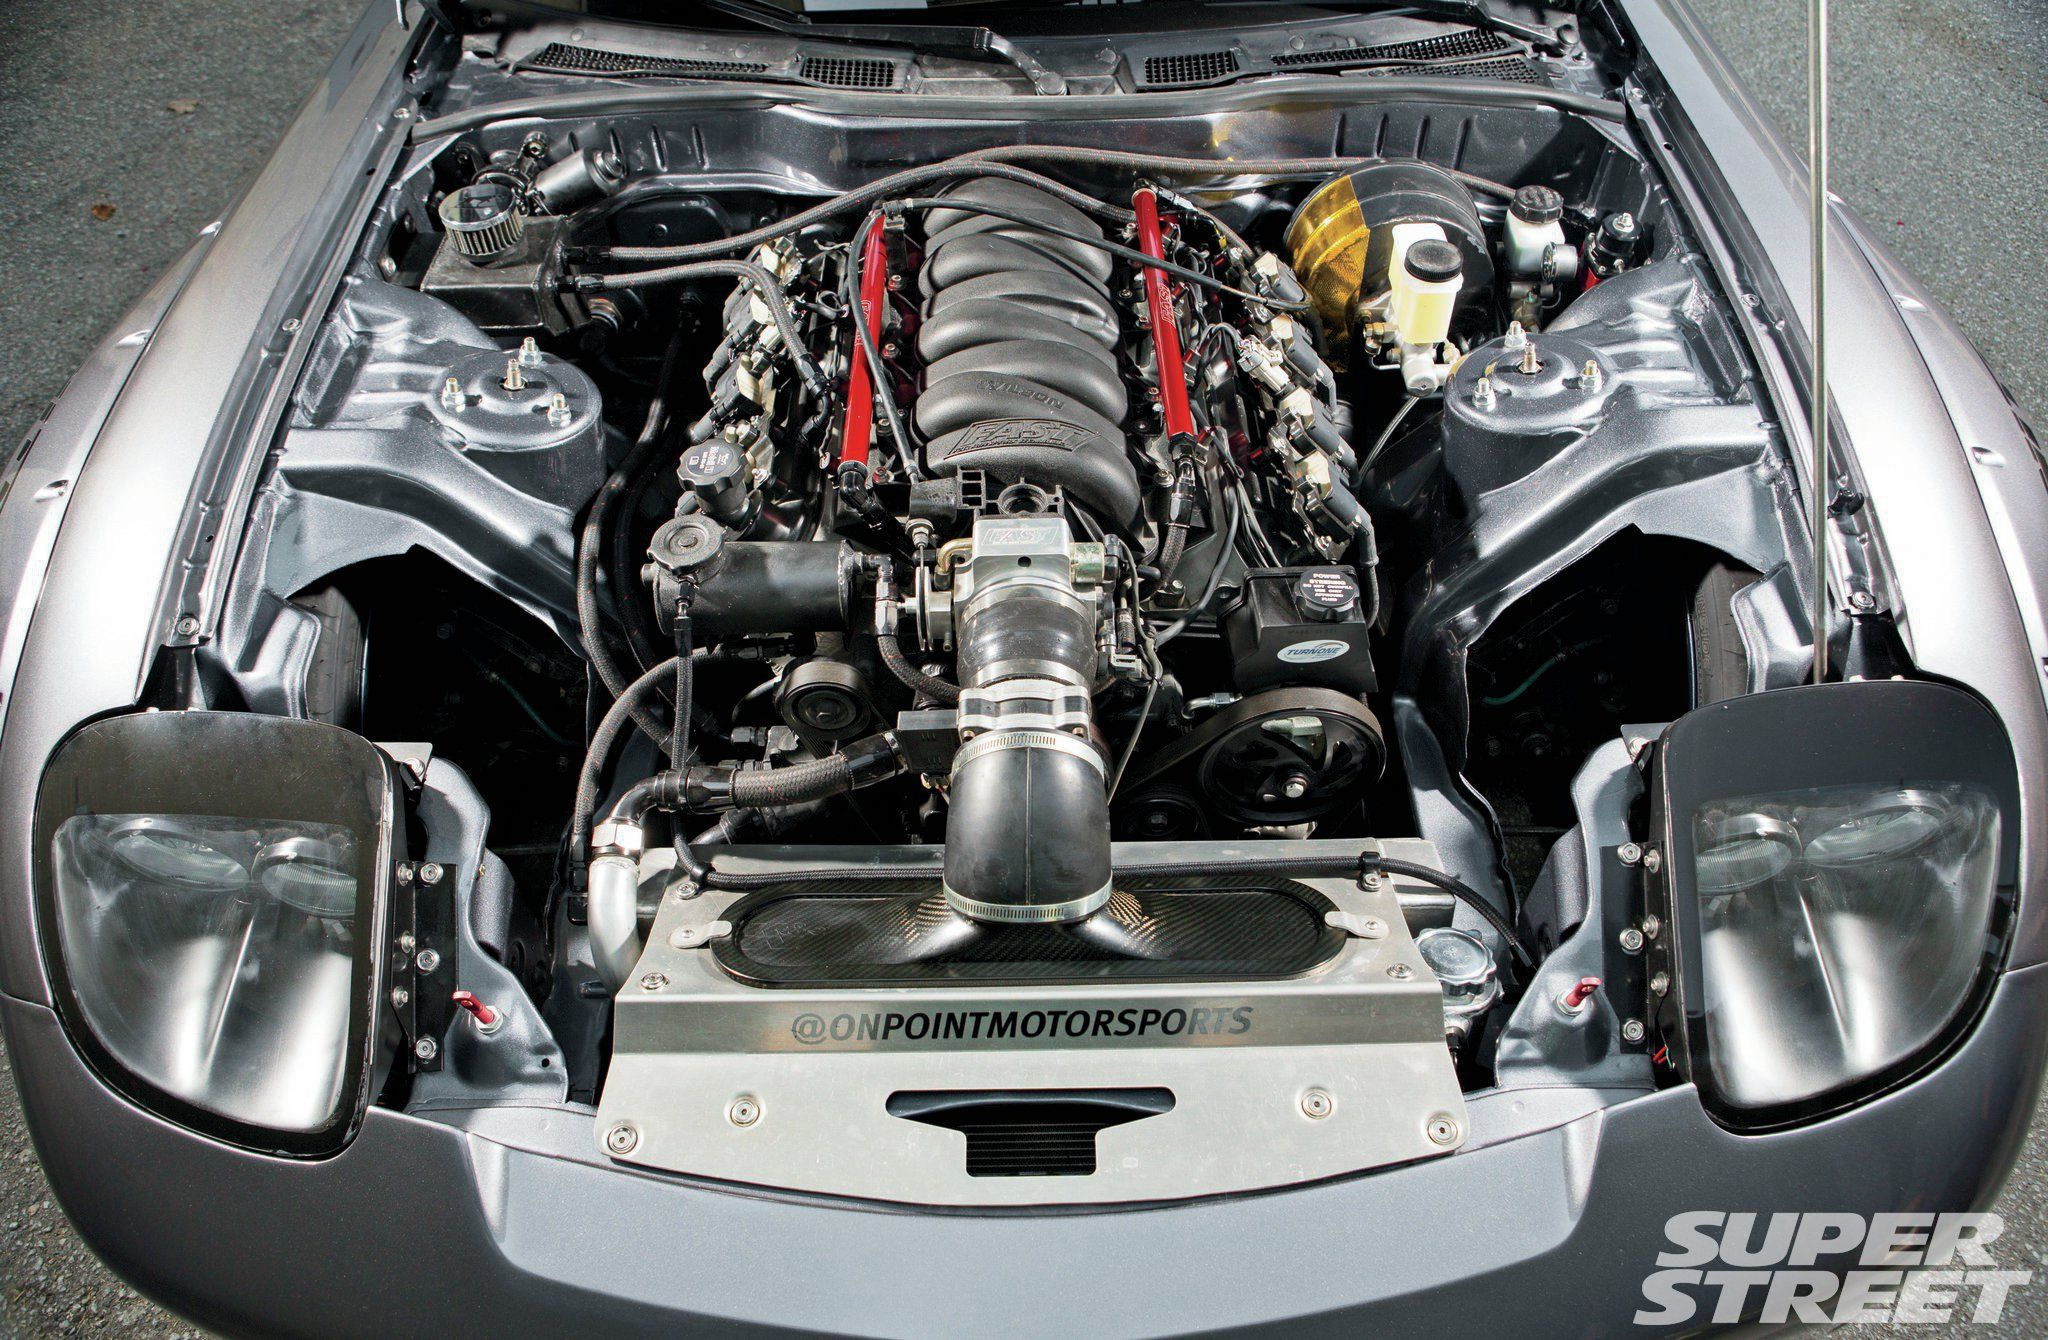 medium resolution of 1993 mazda rx7 gm ls1 engine 06